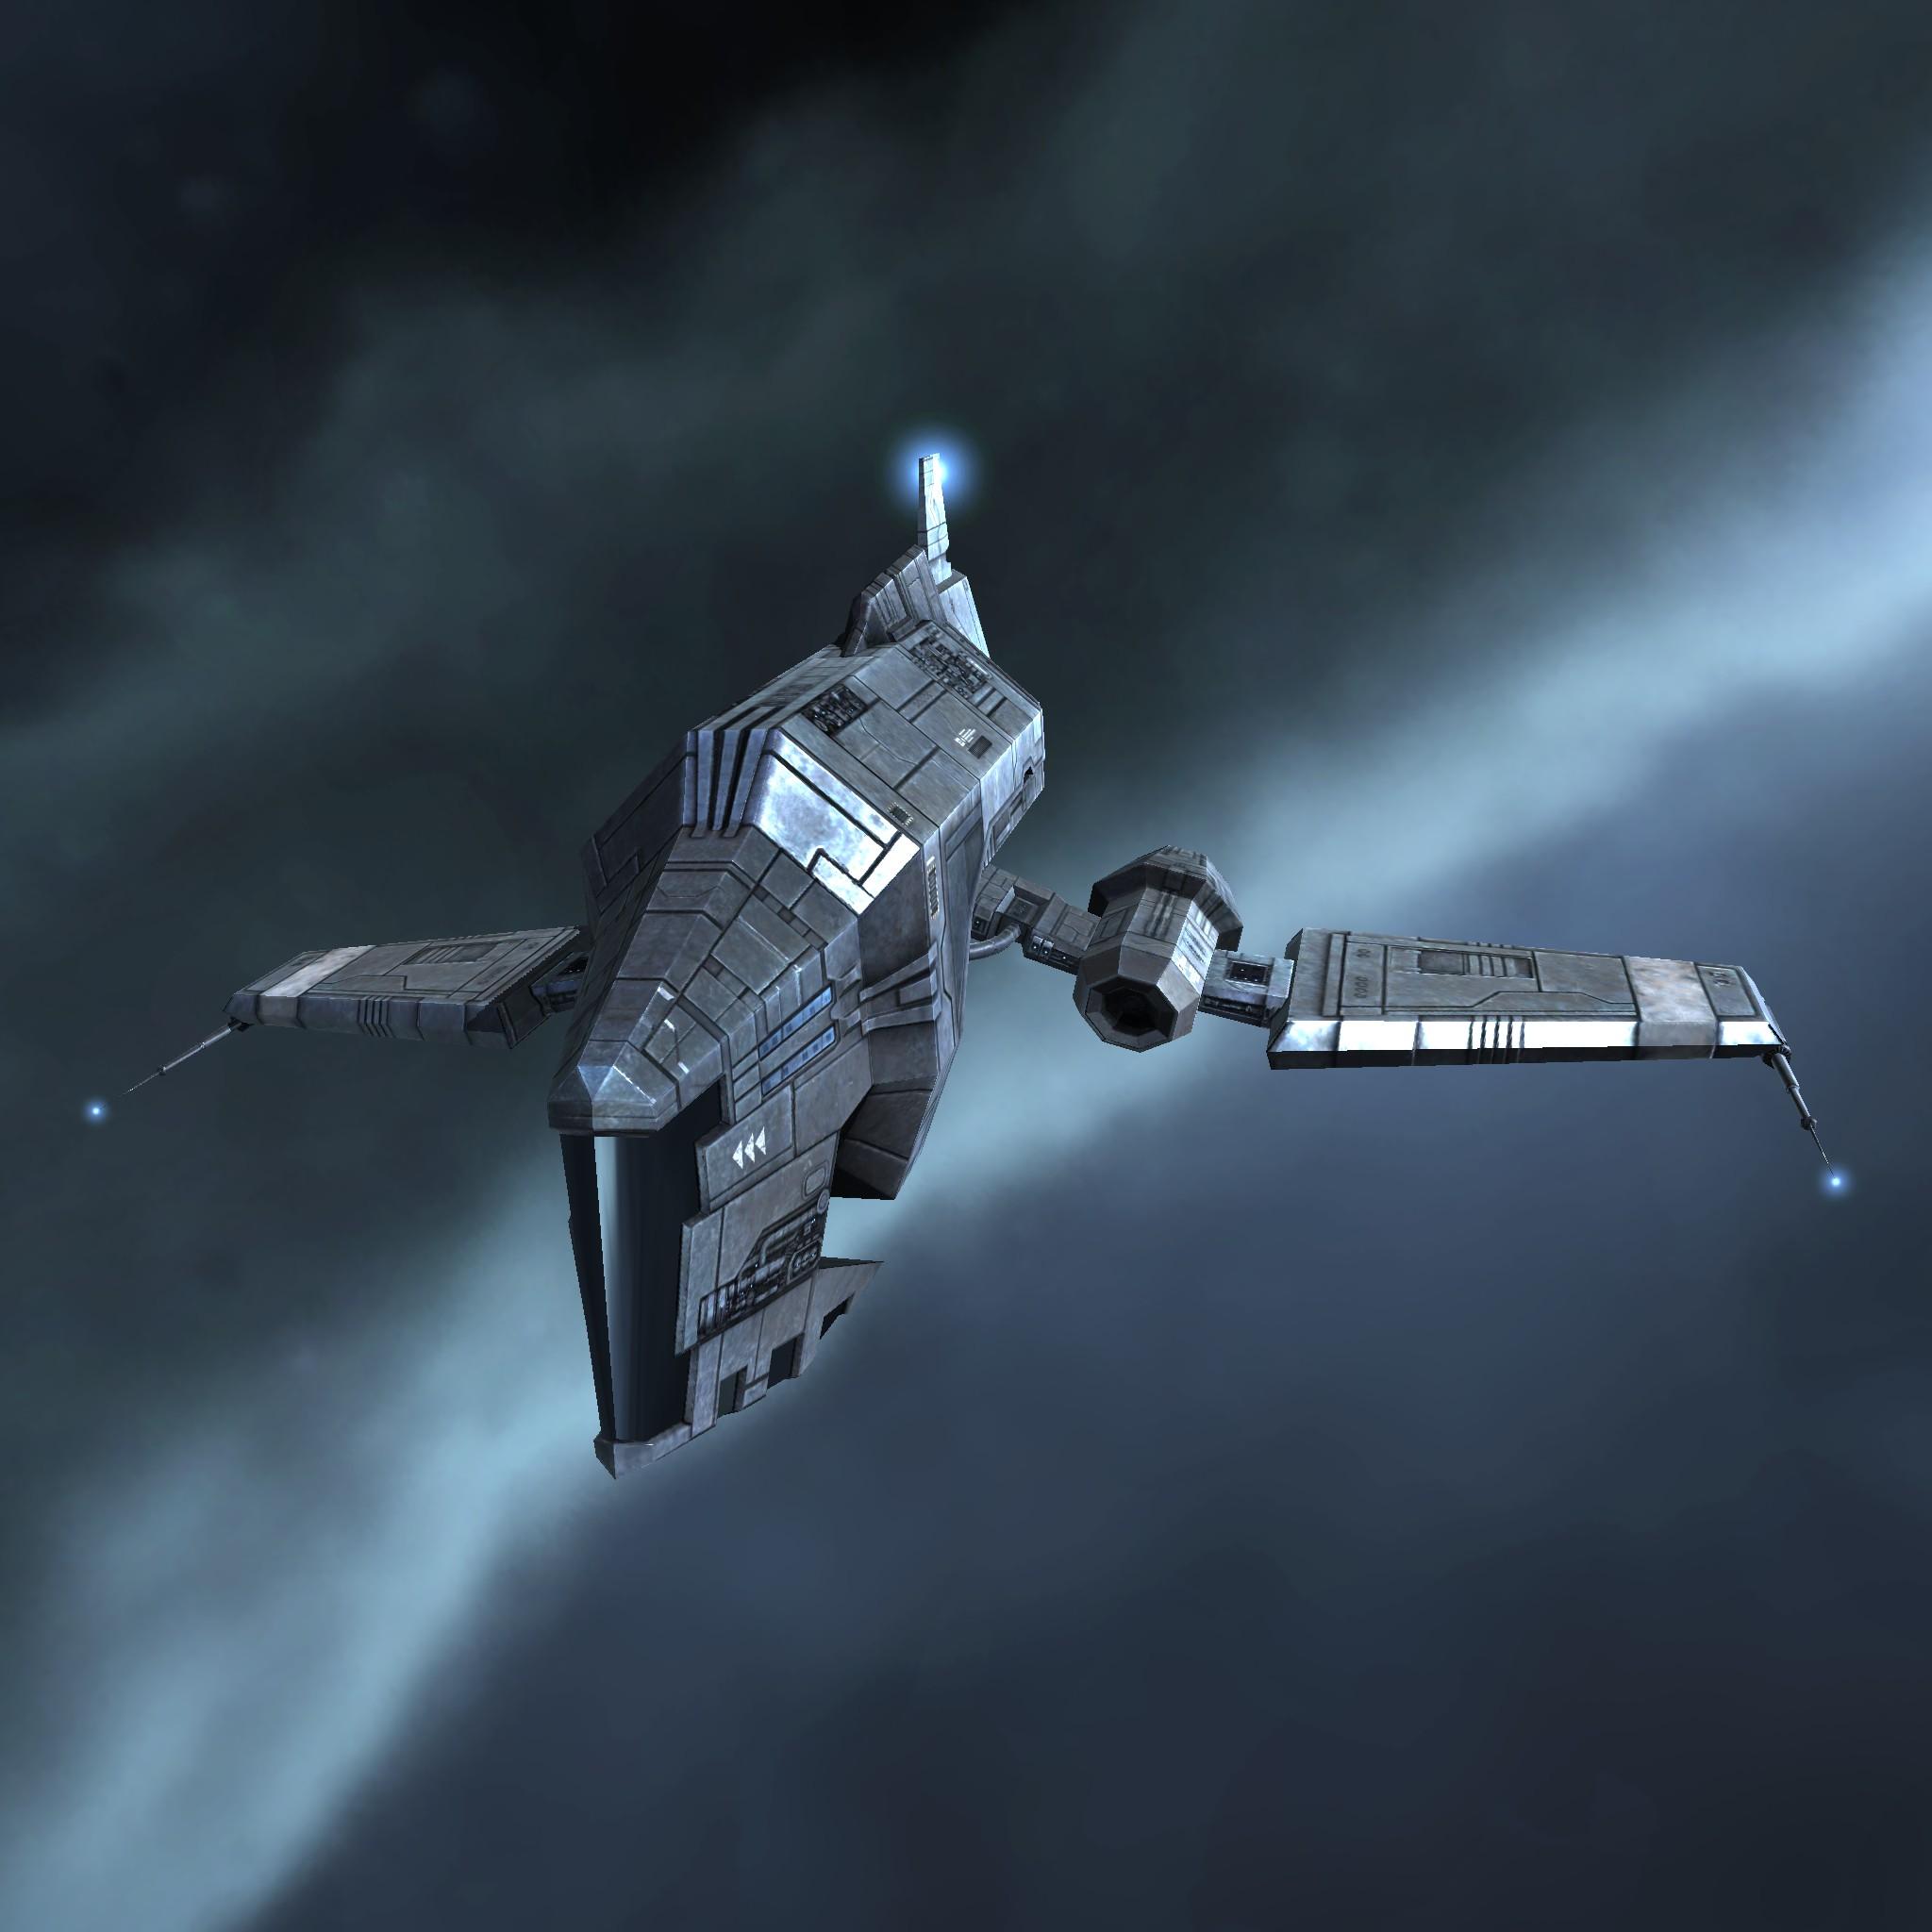 Eve ship civilian caldari shuttle civilian caldari shuttle malvernweather Images